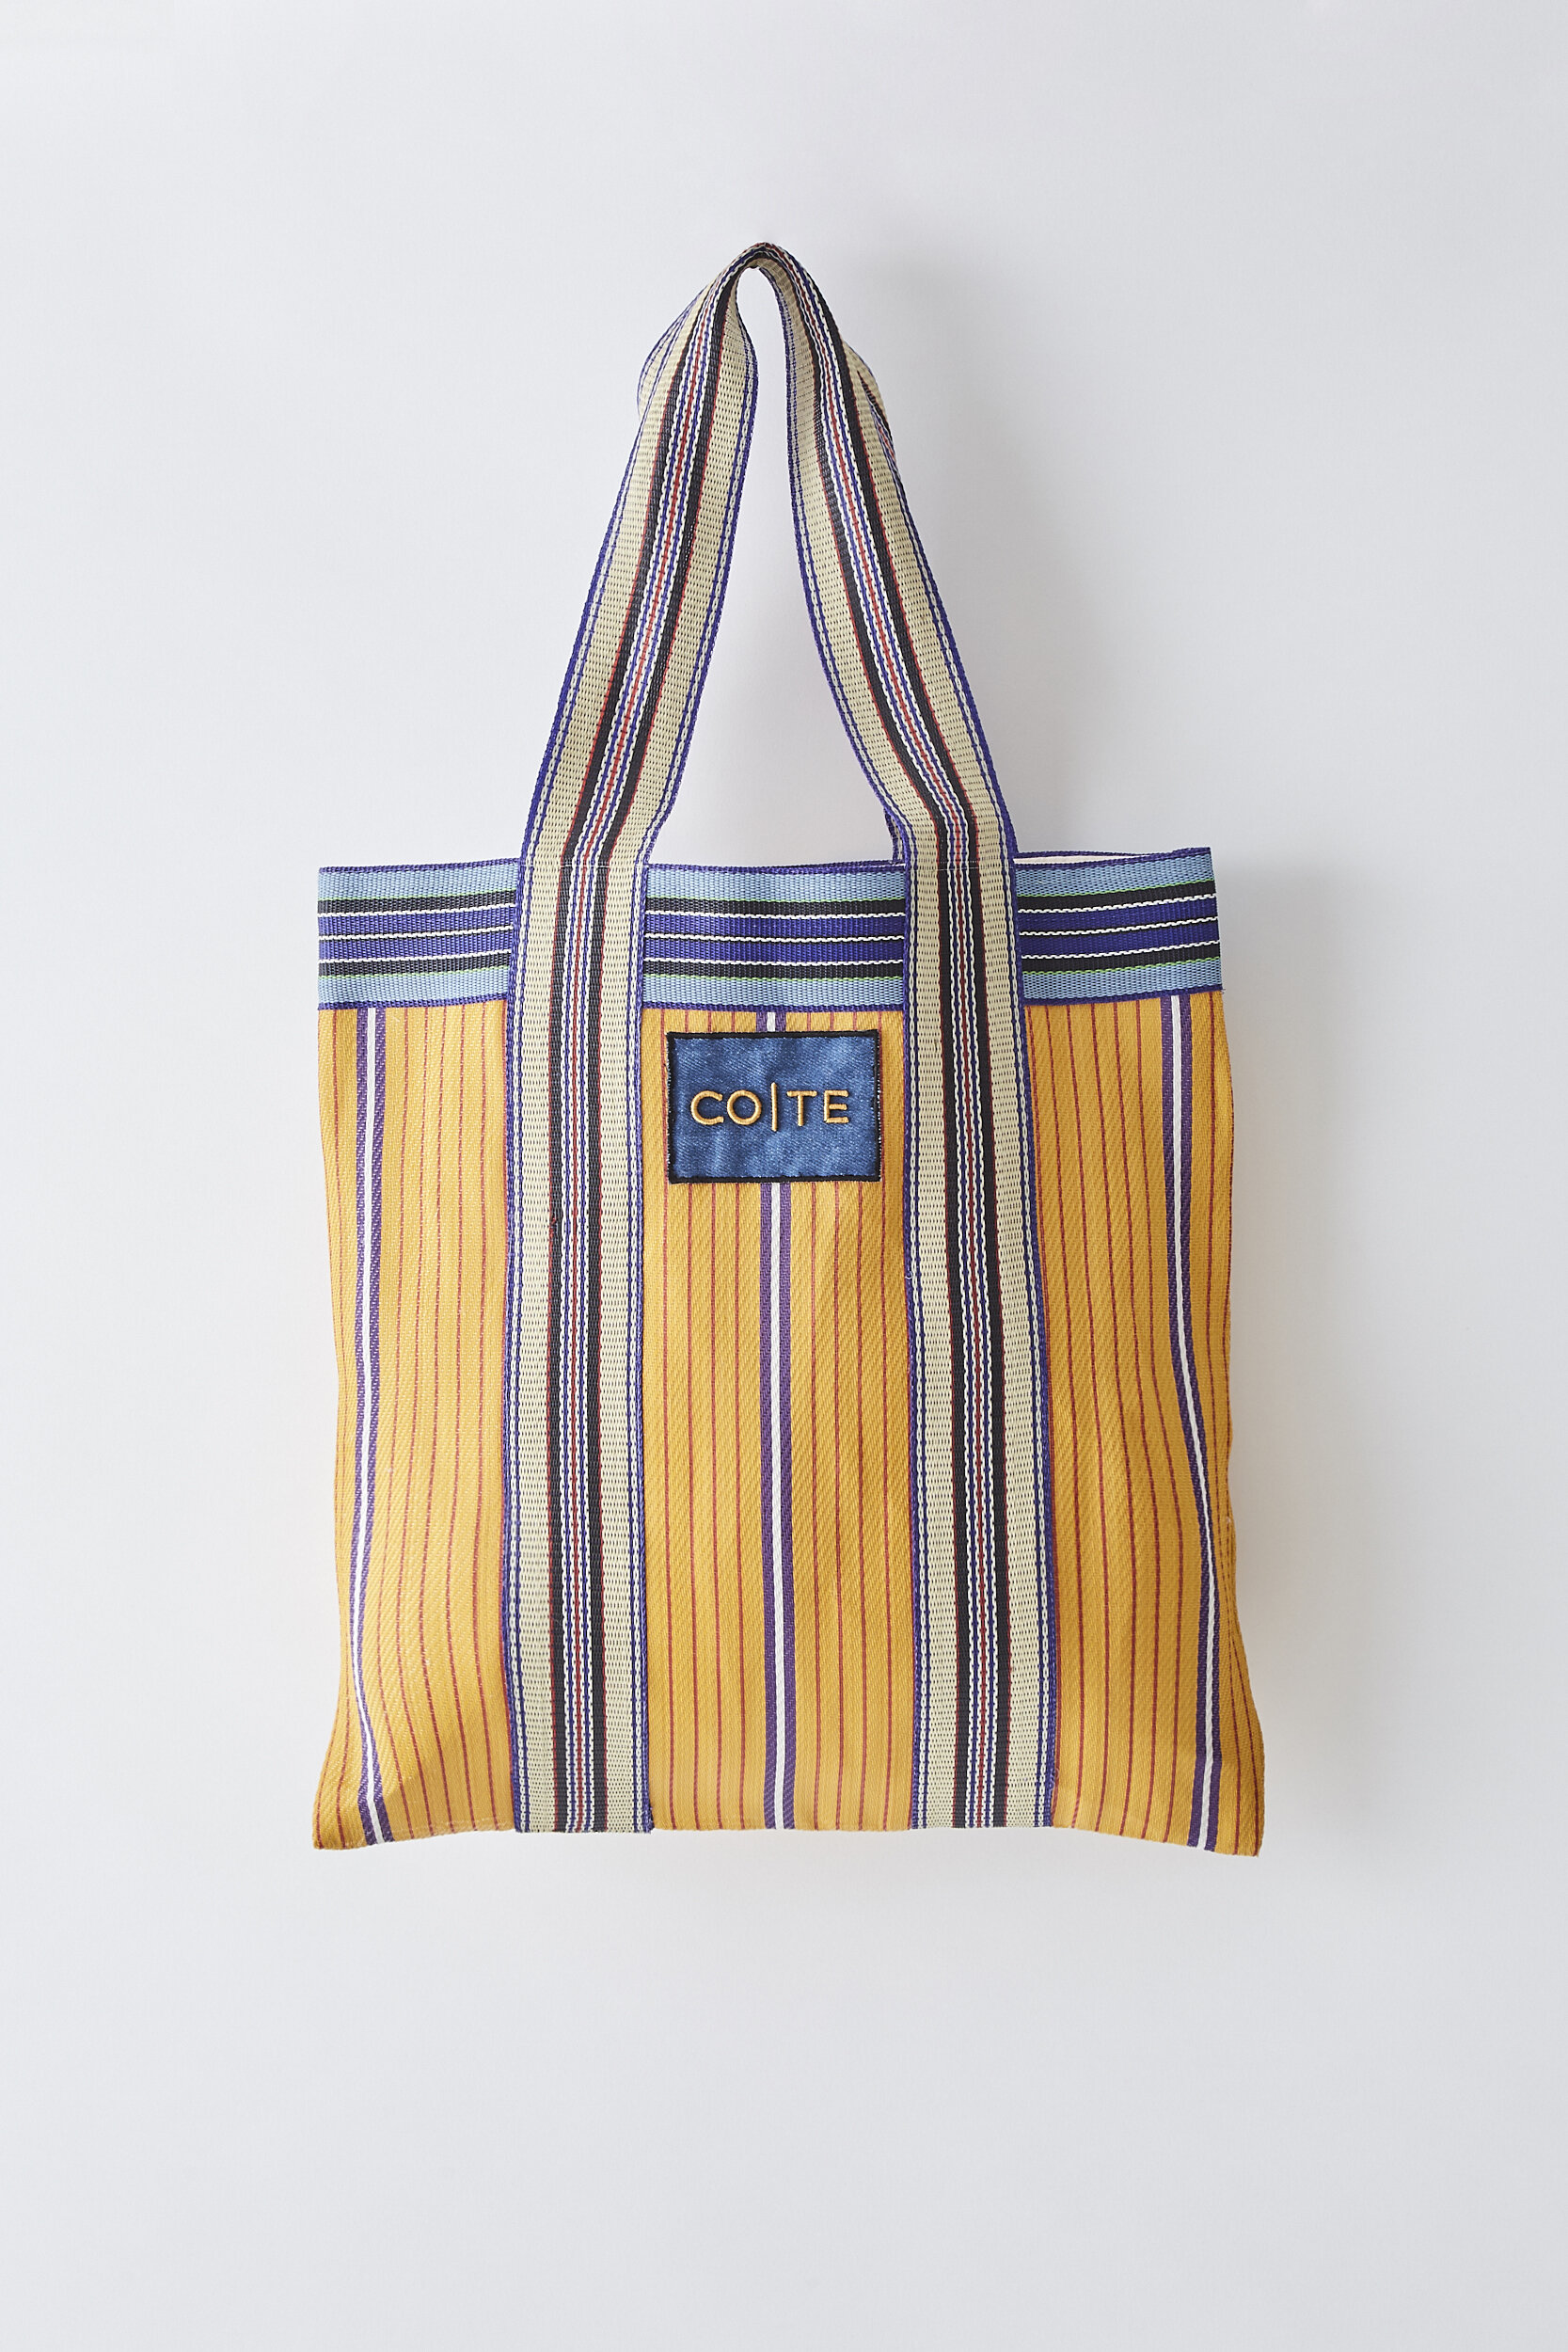 COTE SS2020 Shopping Bag yellow